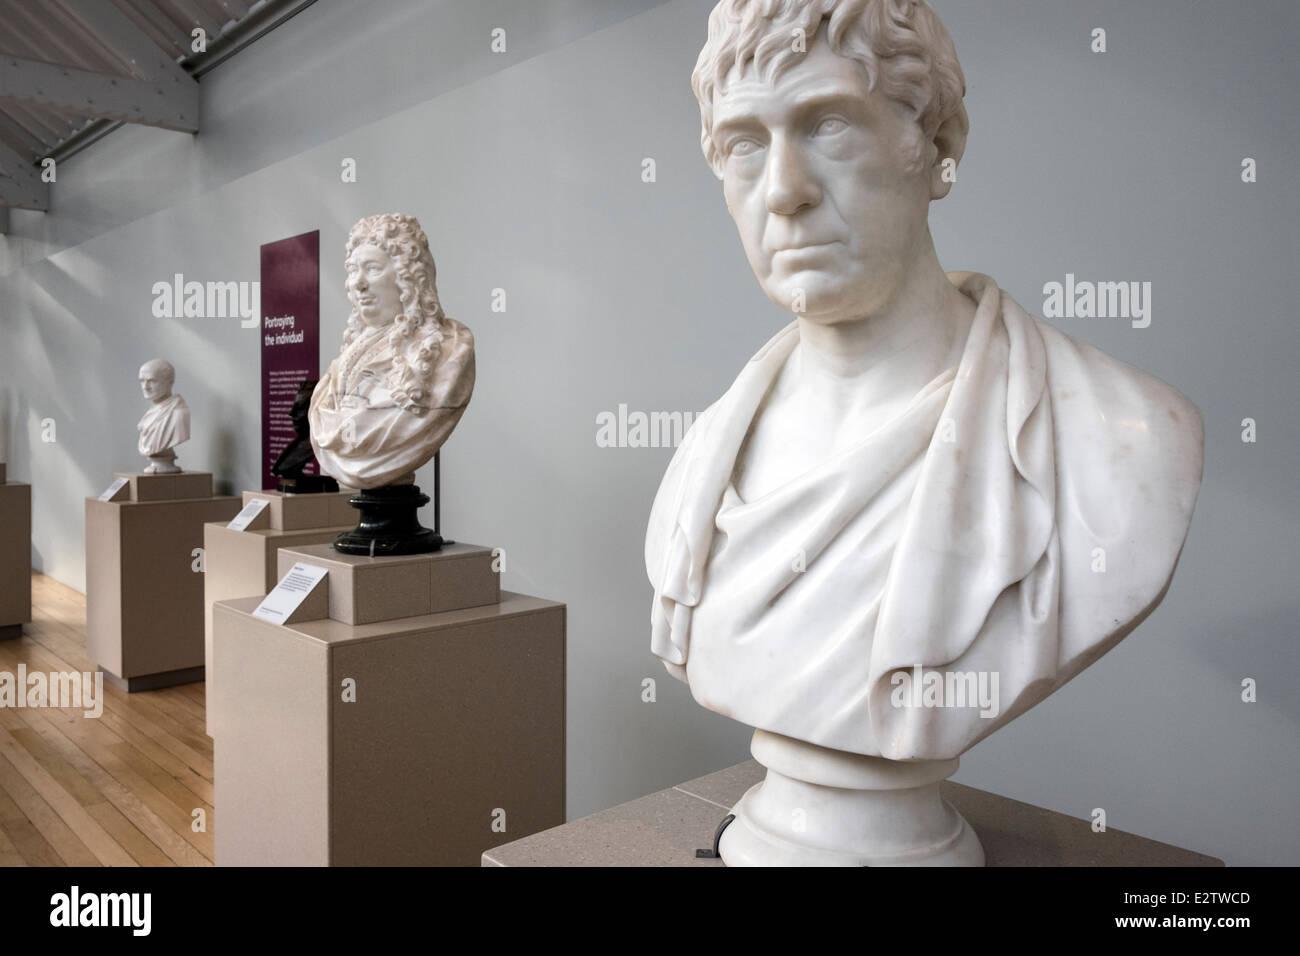 Busts of Joseph Hume (right) and Fabio Feroni (center). National Museum of Scotland, Edinburgh, Scotland - Stock Image